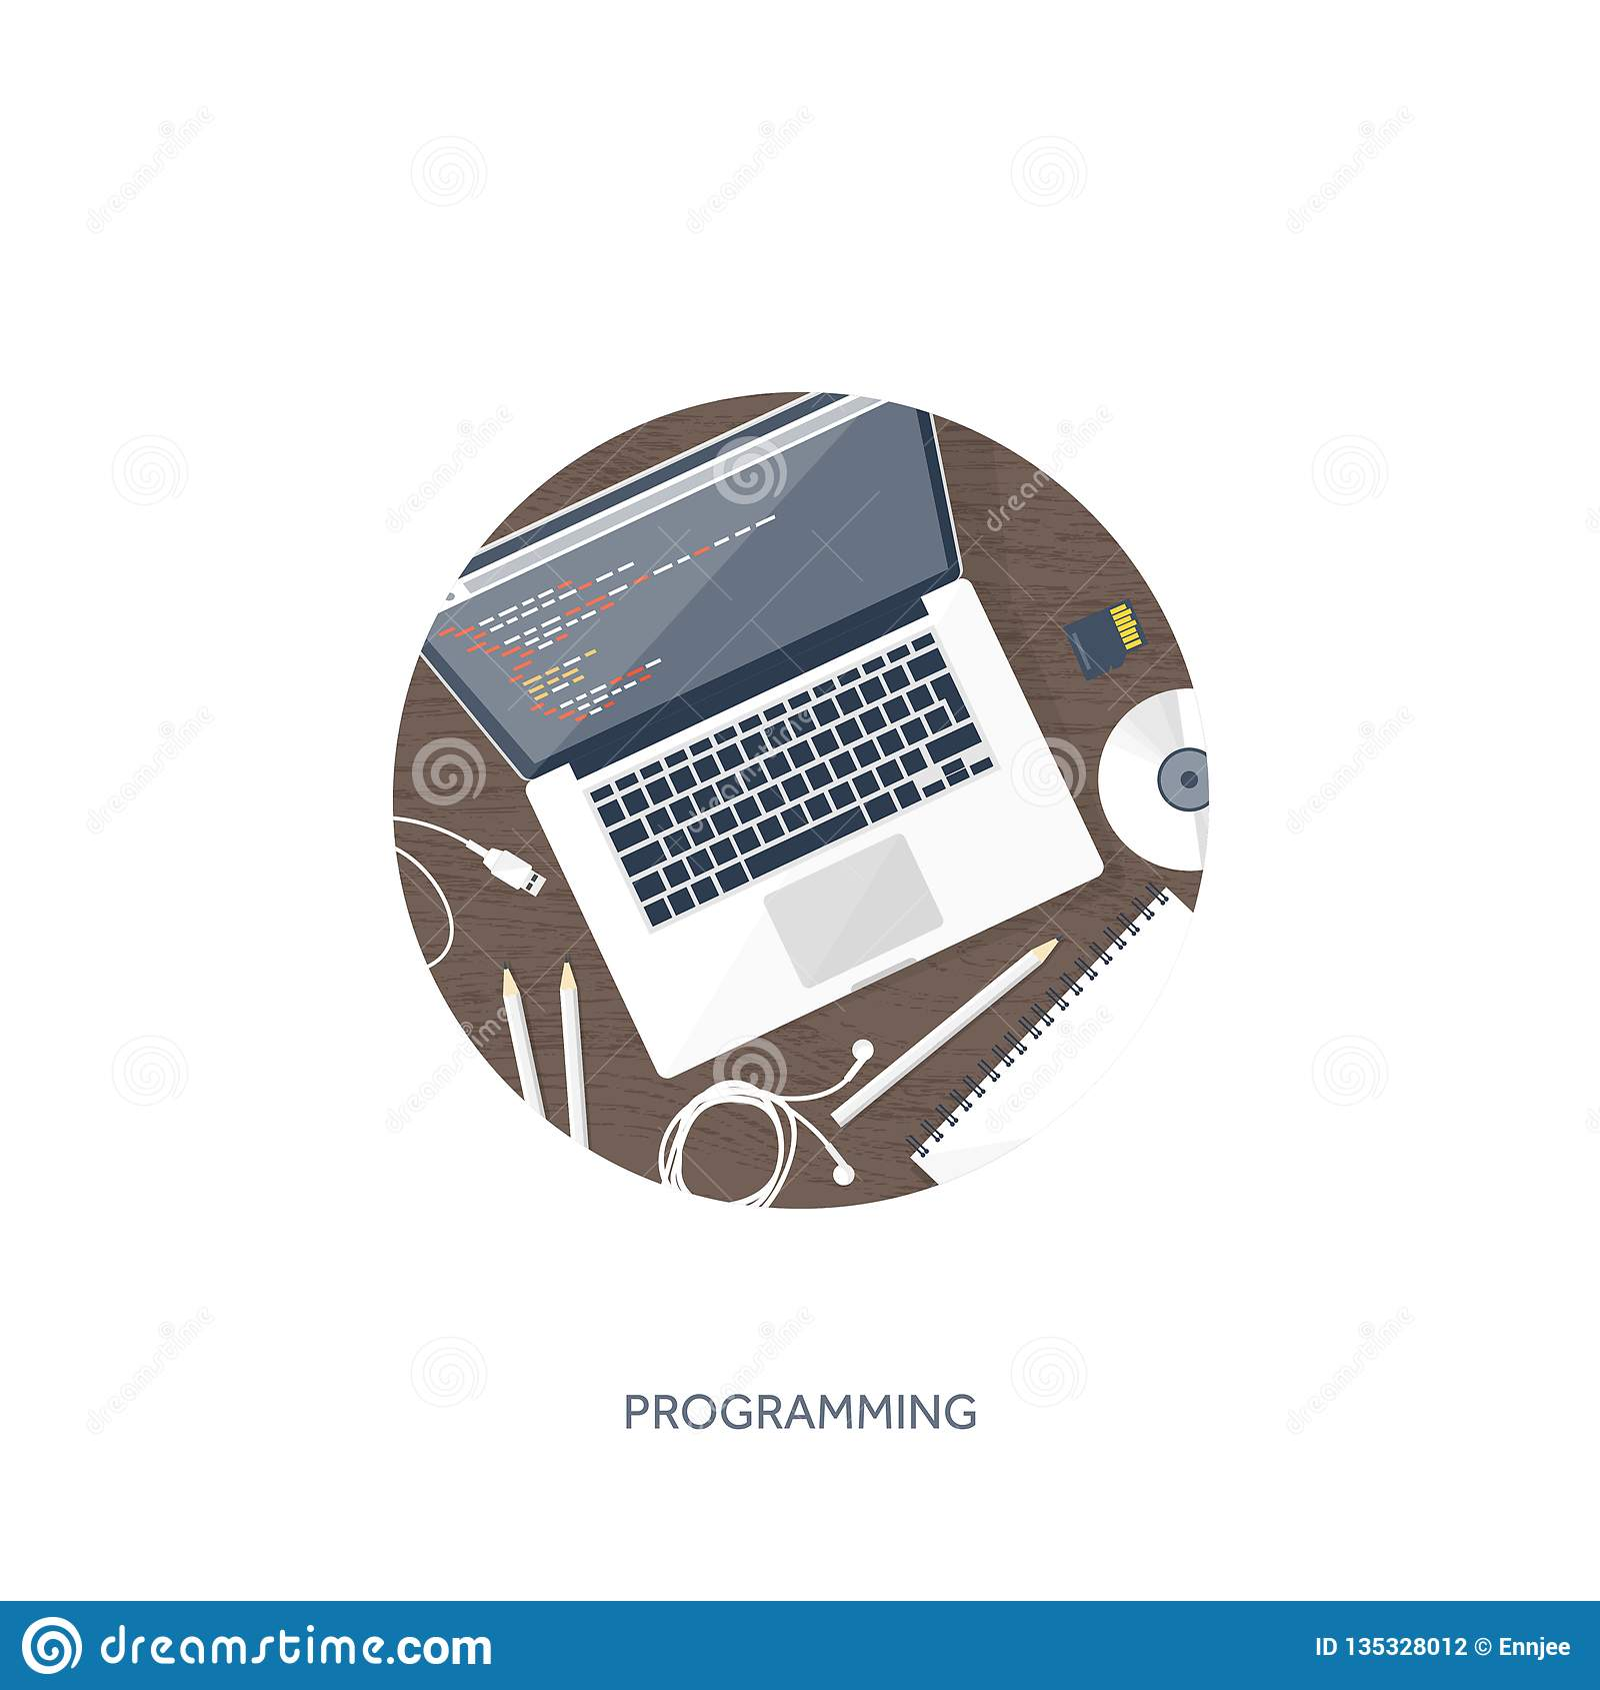 Programming coding and SEO. Flat computing background. Code hardware,software. Web development. Search engine